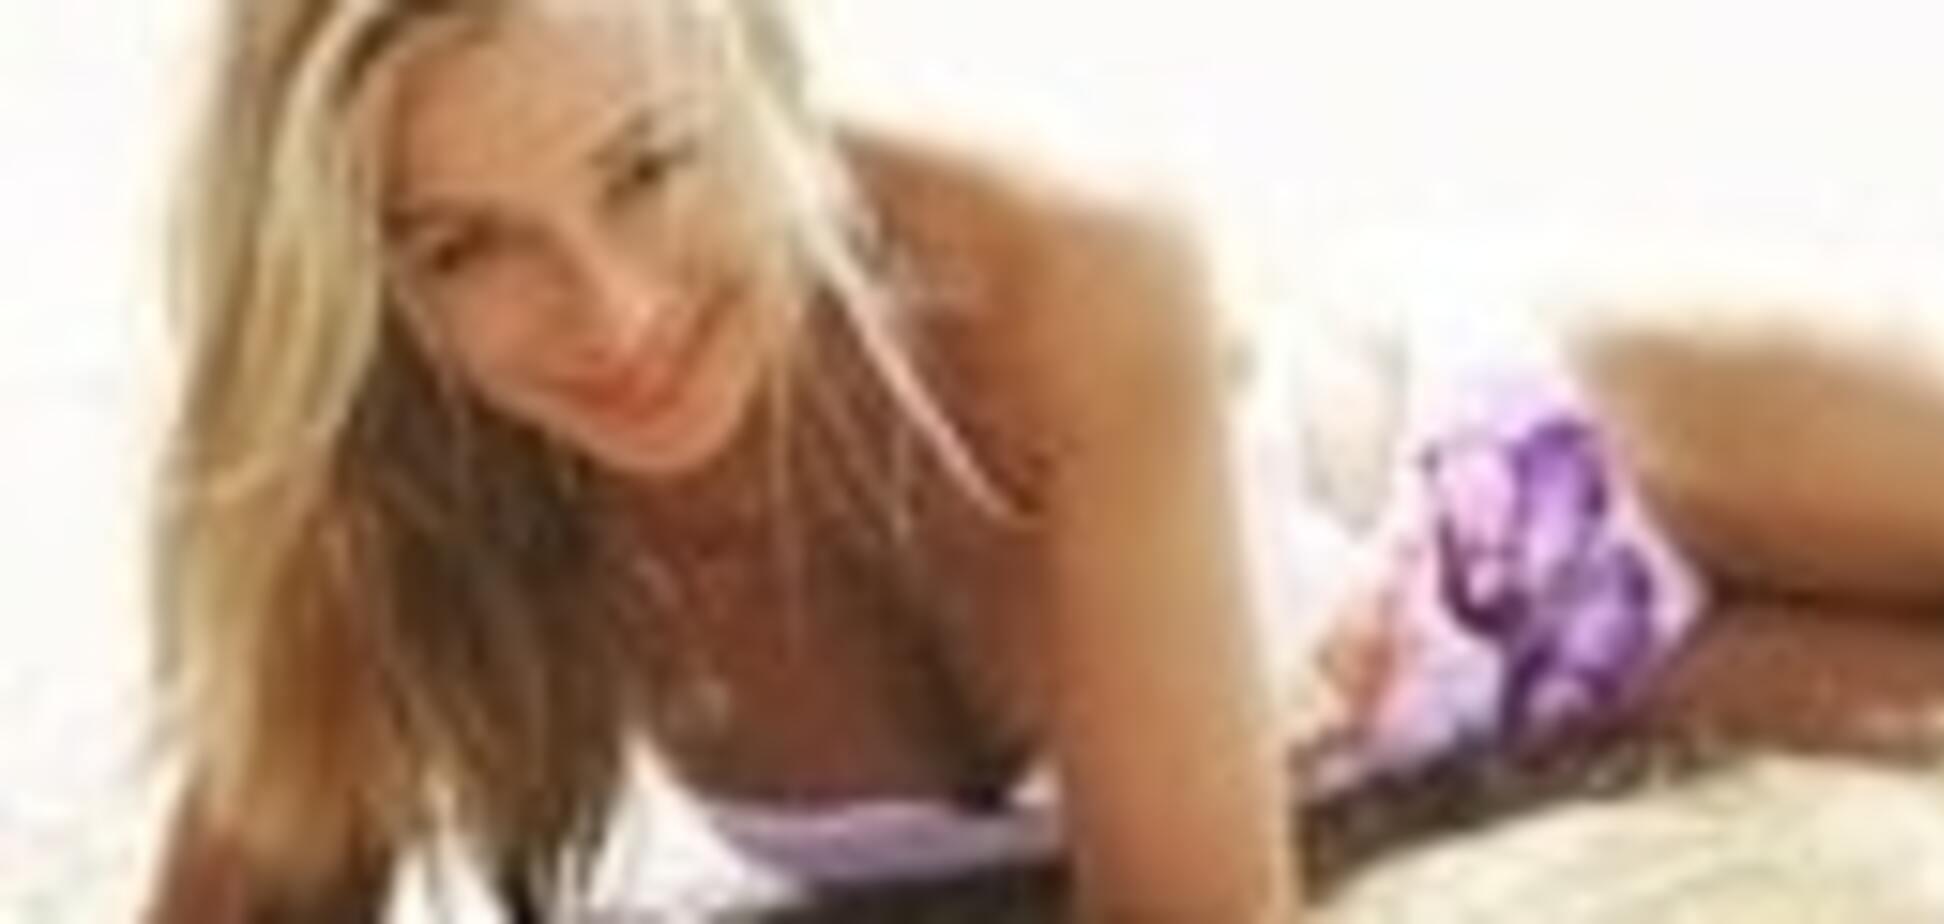 Горячая звезда 90-х: 51-летняя Алена Апина снялась в эро-фотосессии